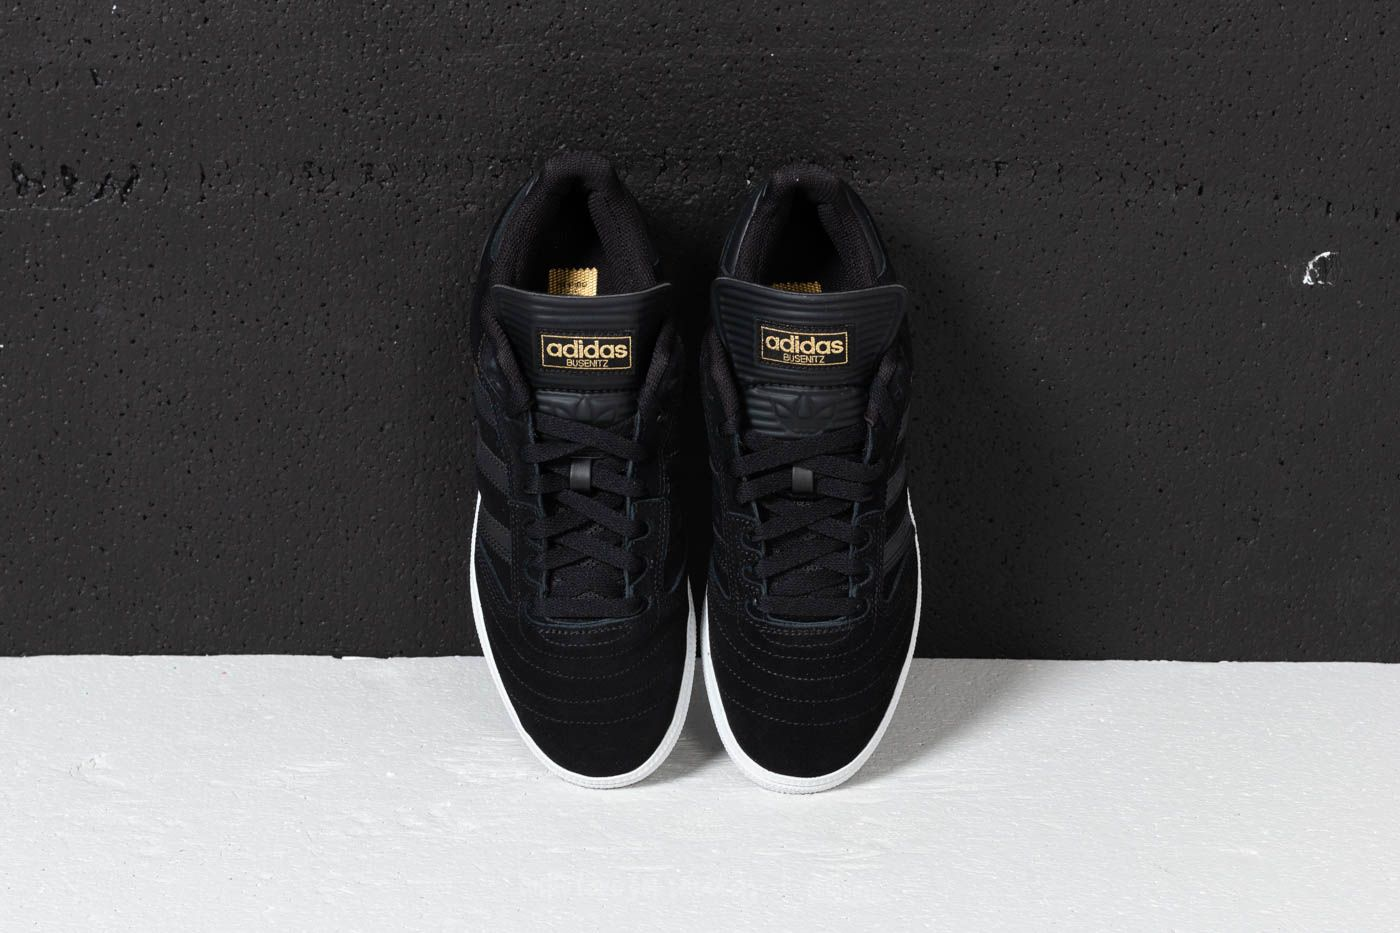 Busenitz Black Ftw Adidas Core WhiteFootshop qULGjzVpSM